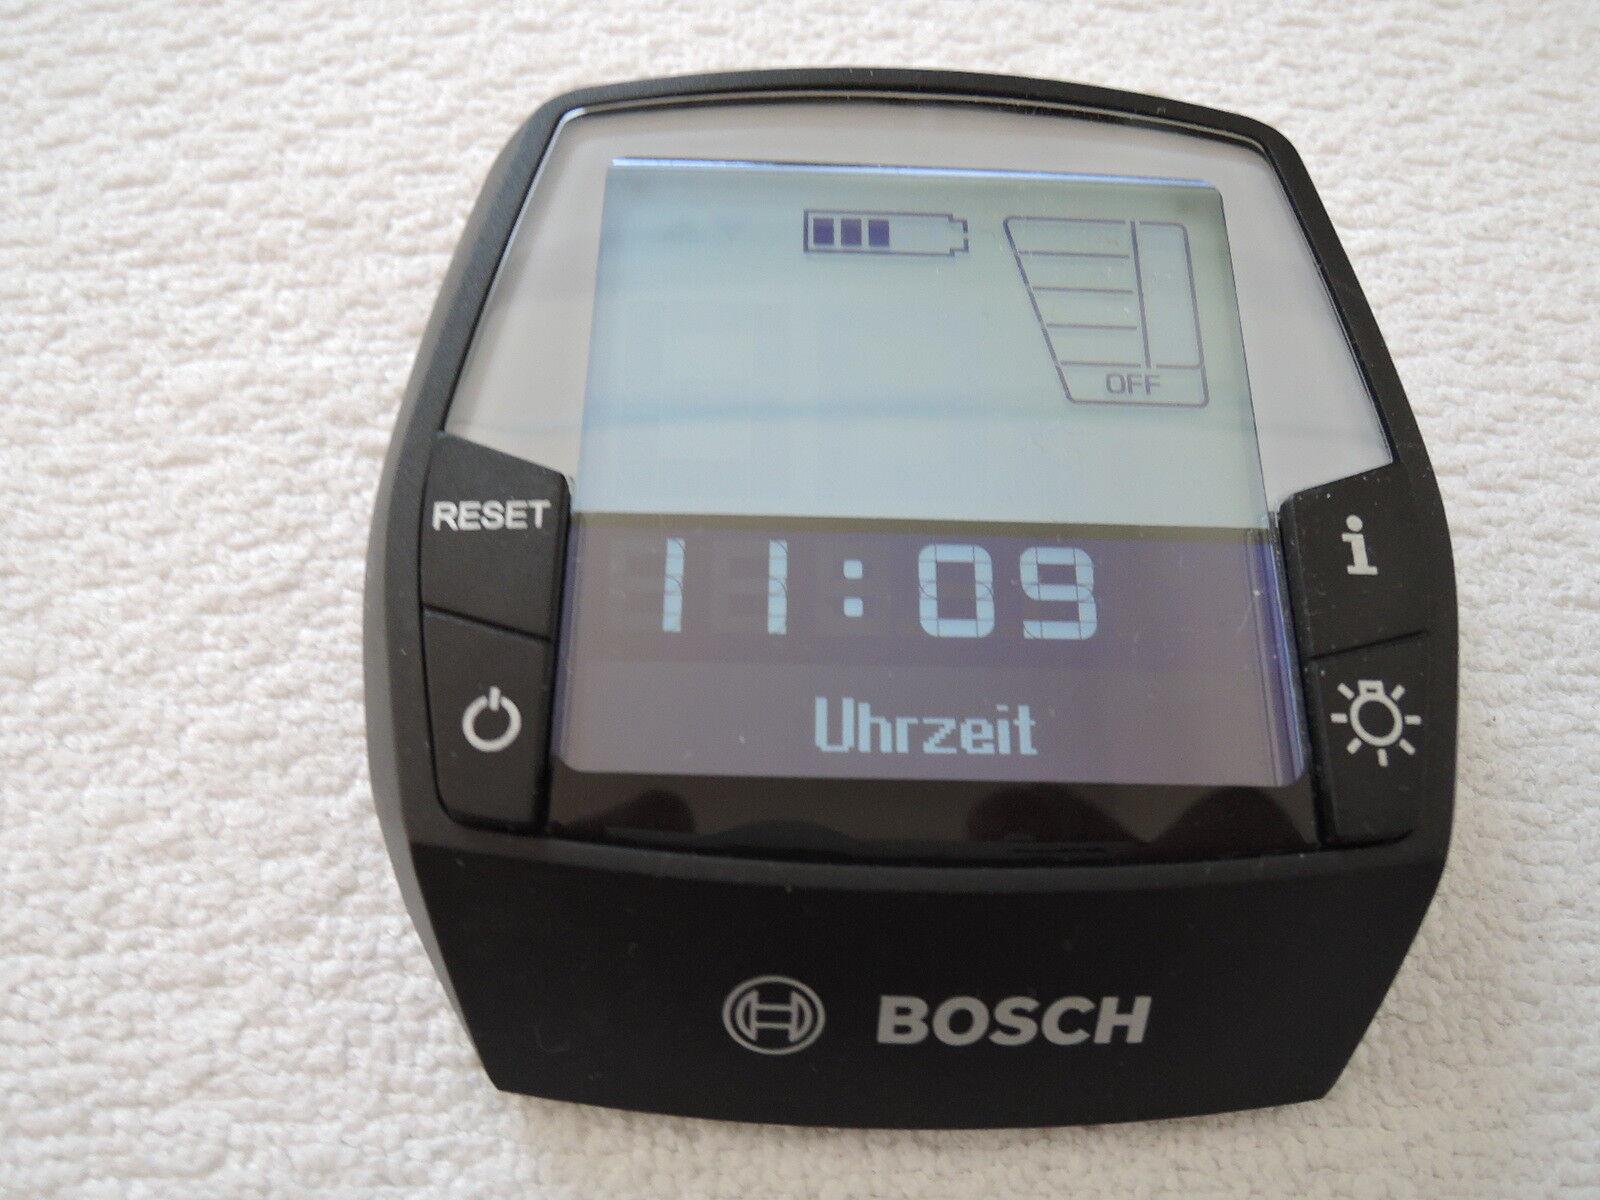 Bosch Intuvia Performance Line anthrazit Display 1270 020 909